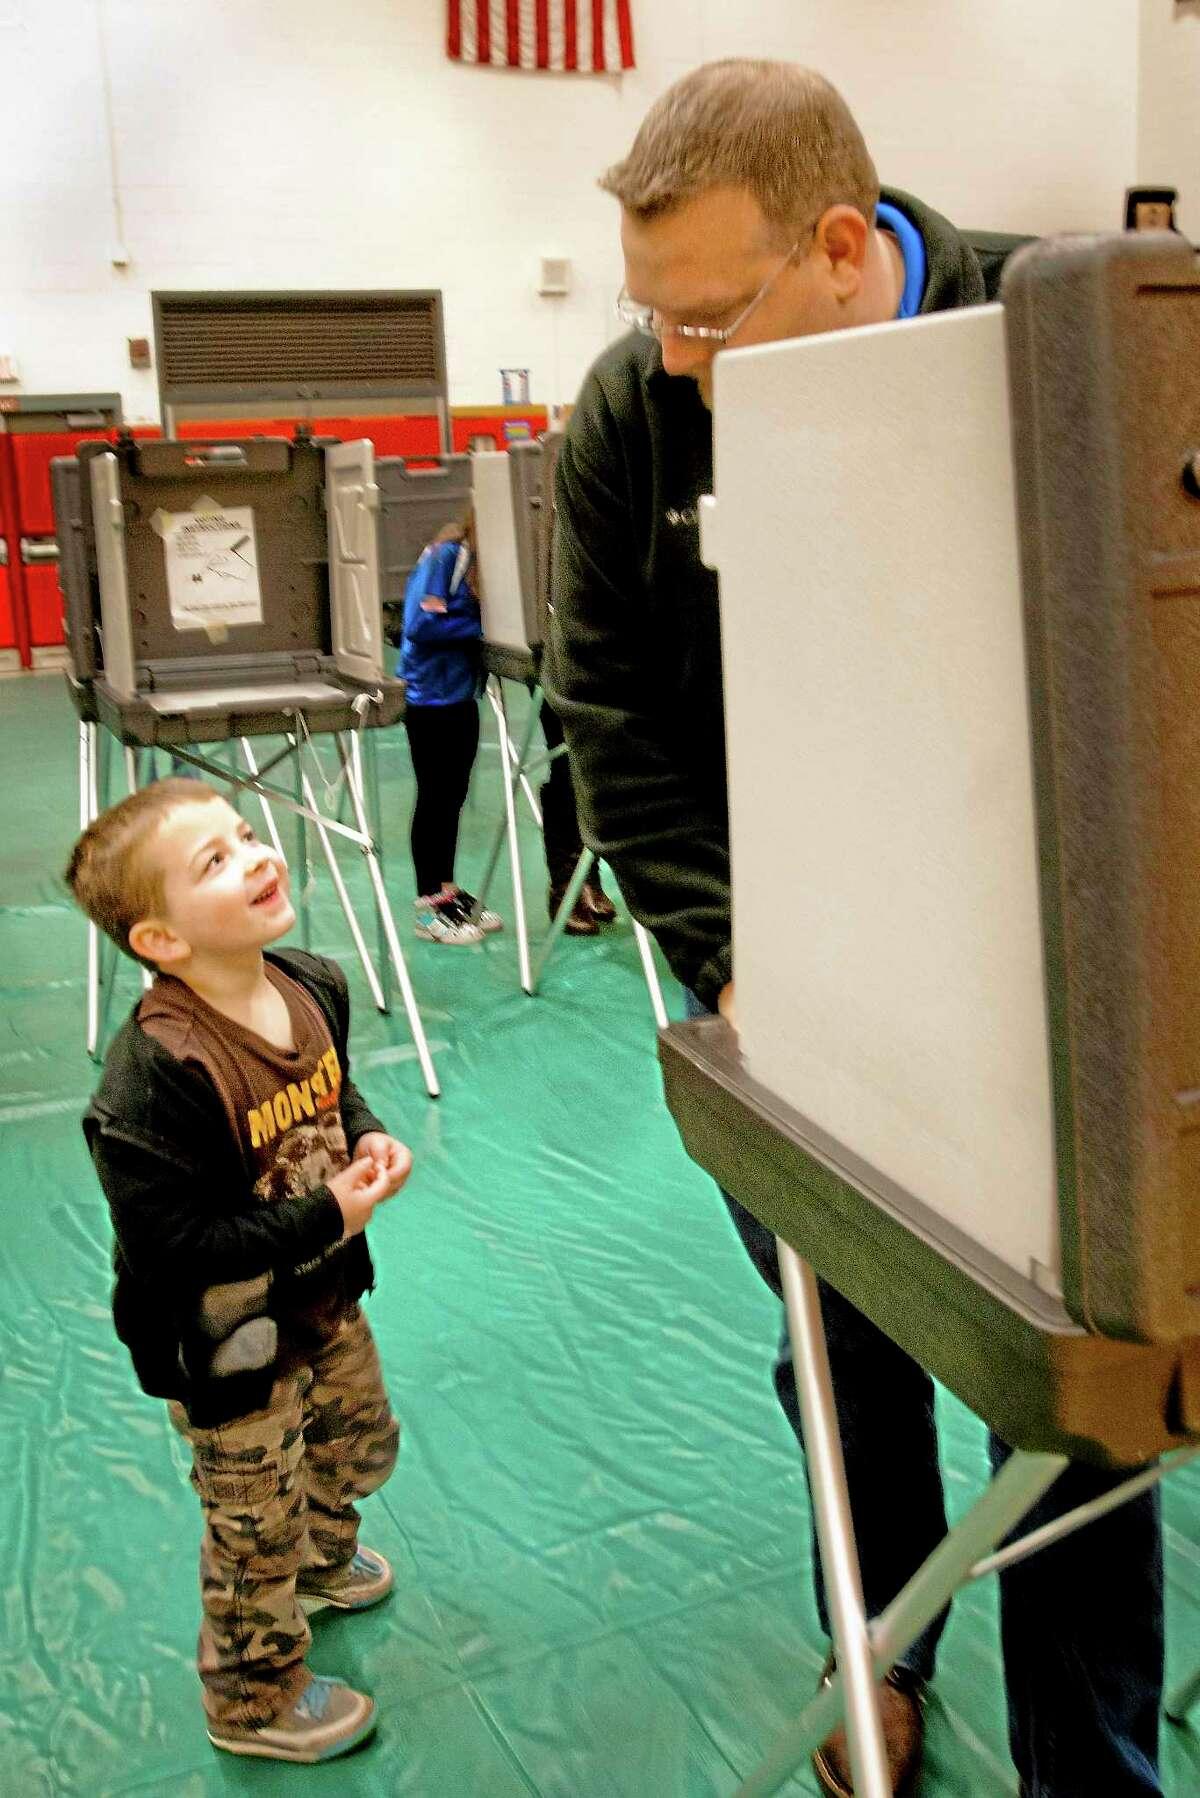 Jake Chikowski, left, gets a civic lesson from dad, Joseph Chikowski, at Foran High School.